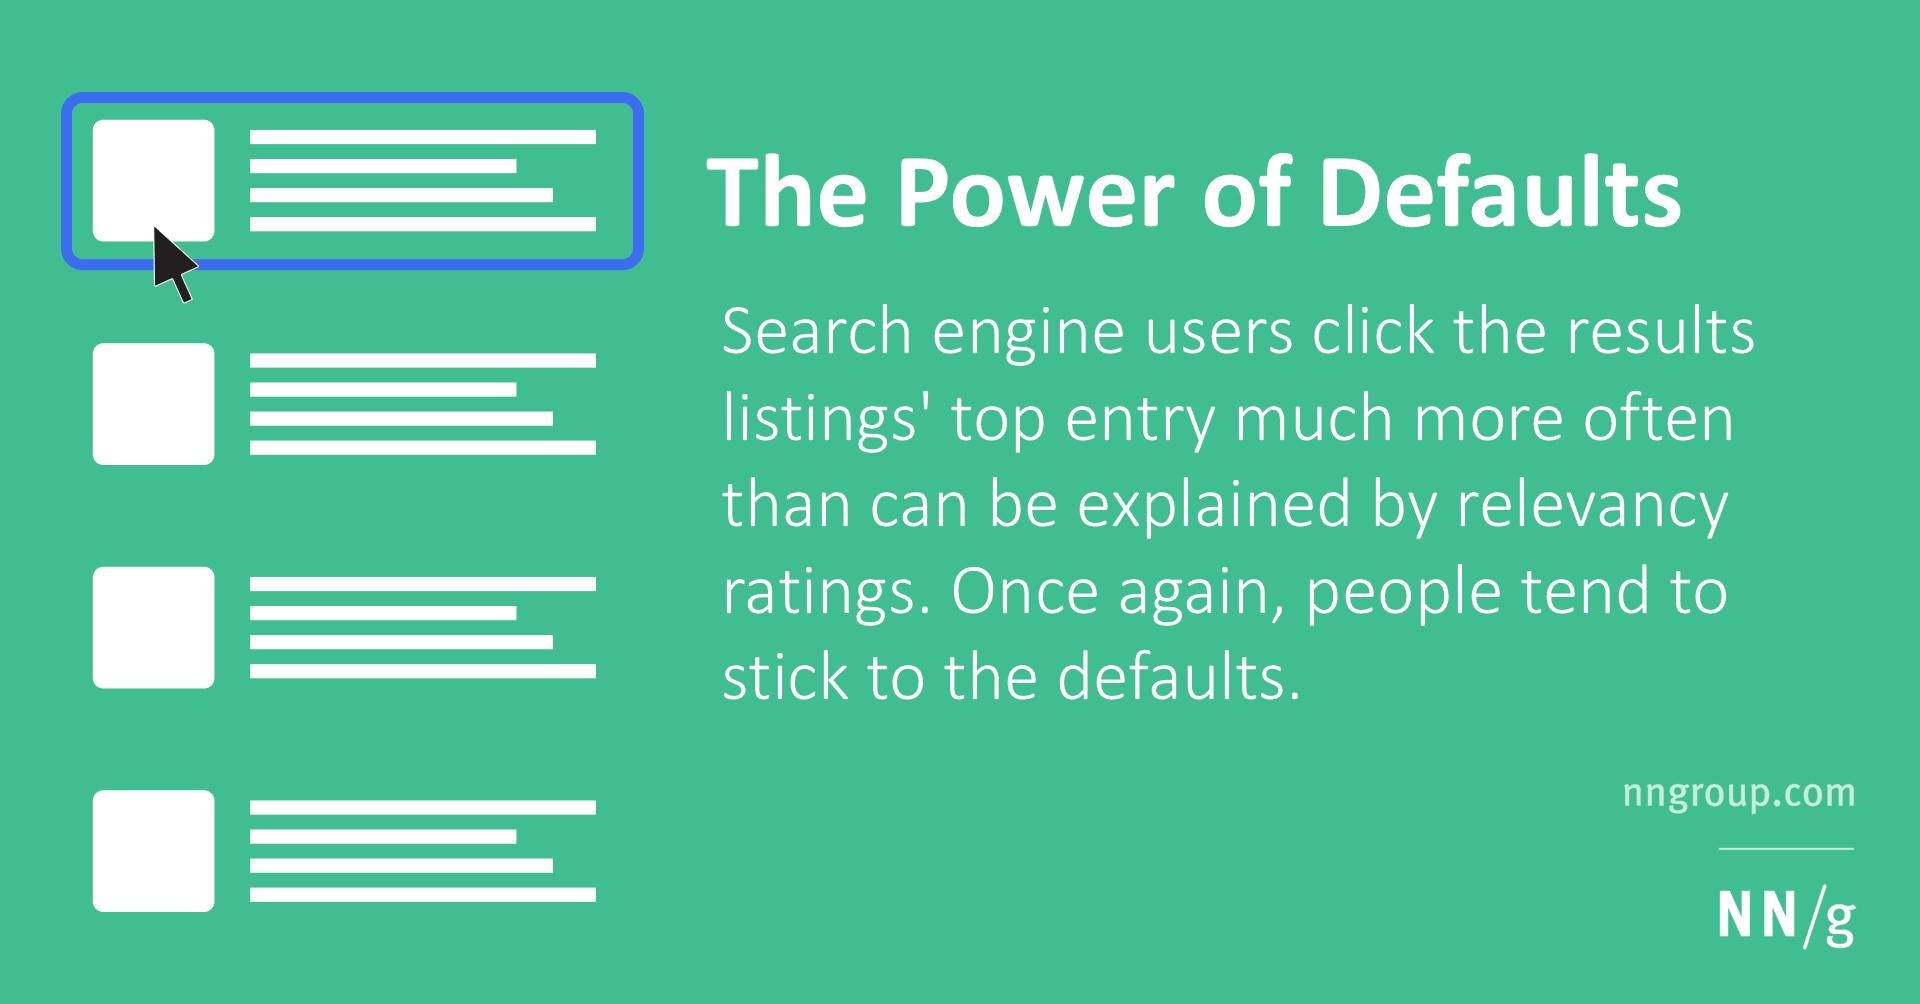 Default-Bias-Varsayımsal-Önyargı -userspots-bilissel-egilim-cognitive-bias